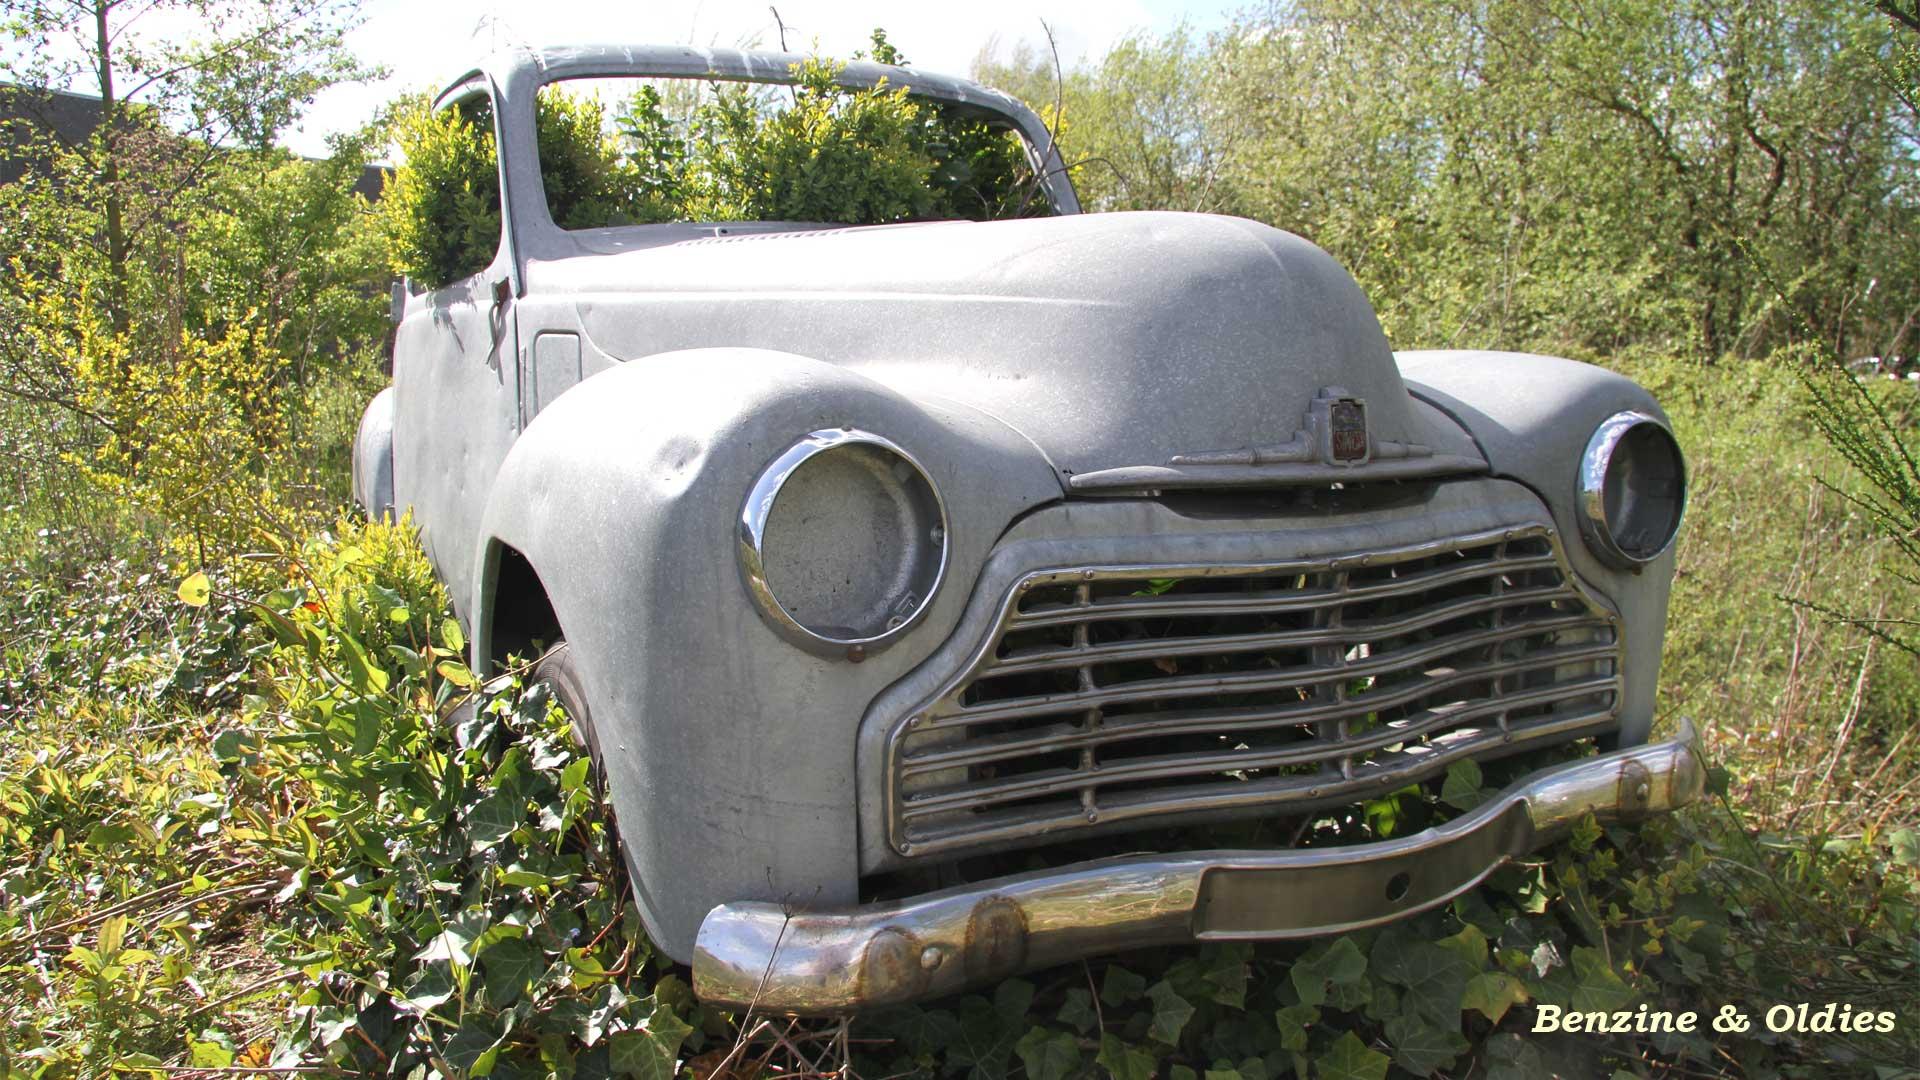 une Simca 6 carrosserie aluminium oubliée dans la nature - Simca6 - Page 2 909821simca6street42w19201080